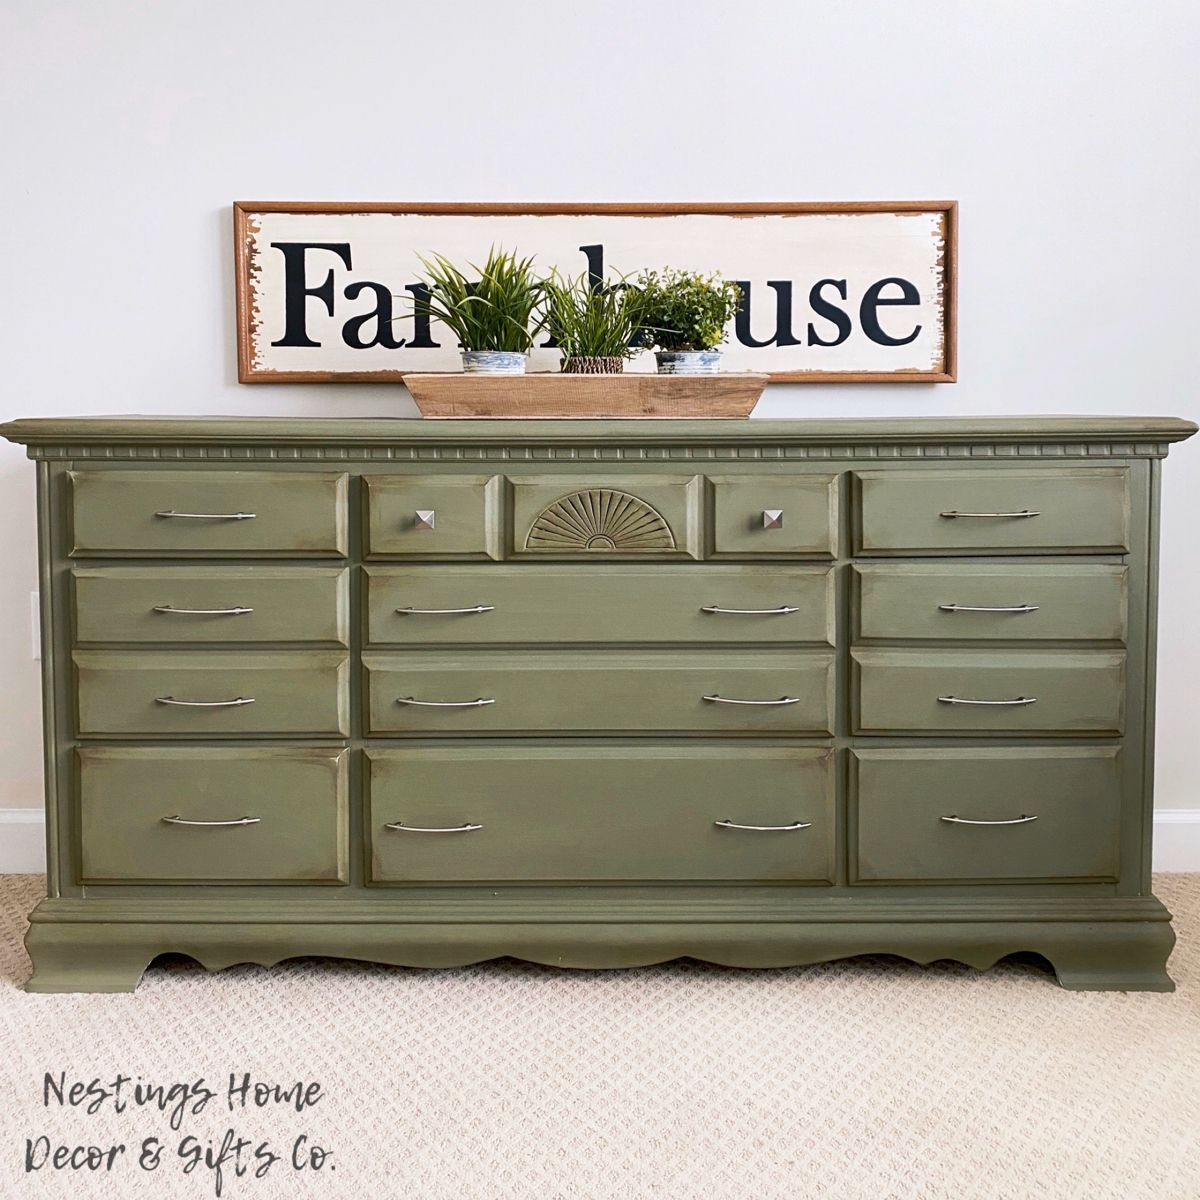 #anniesloan #anniesloanchalkpaint #chalkpaint #chalkpaintfurniture #furniturepainting #furnituremakeover #furnitureideas #upcycling